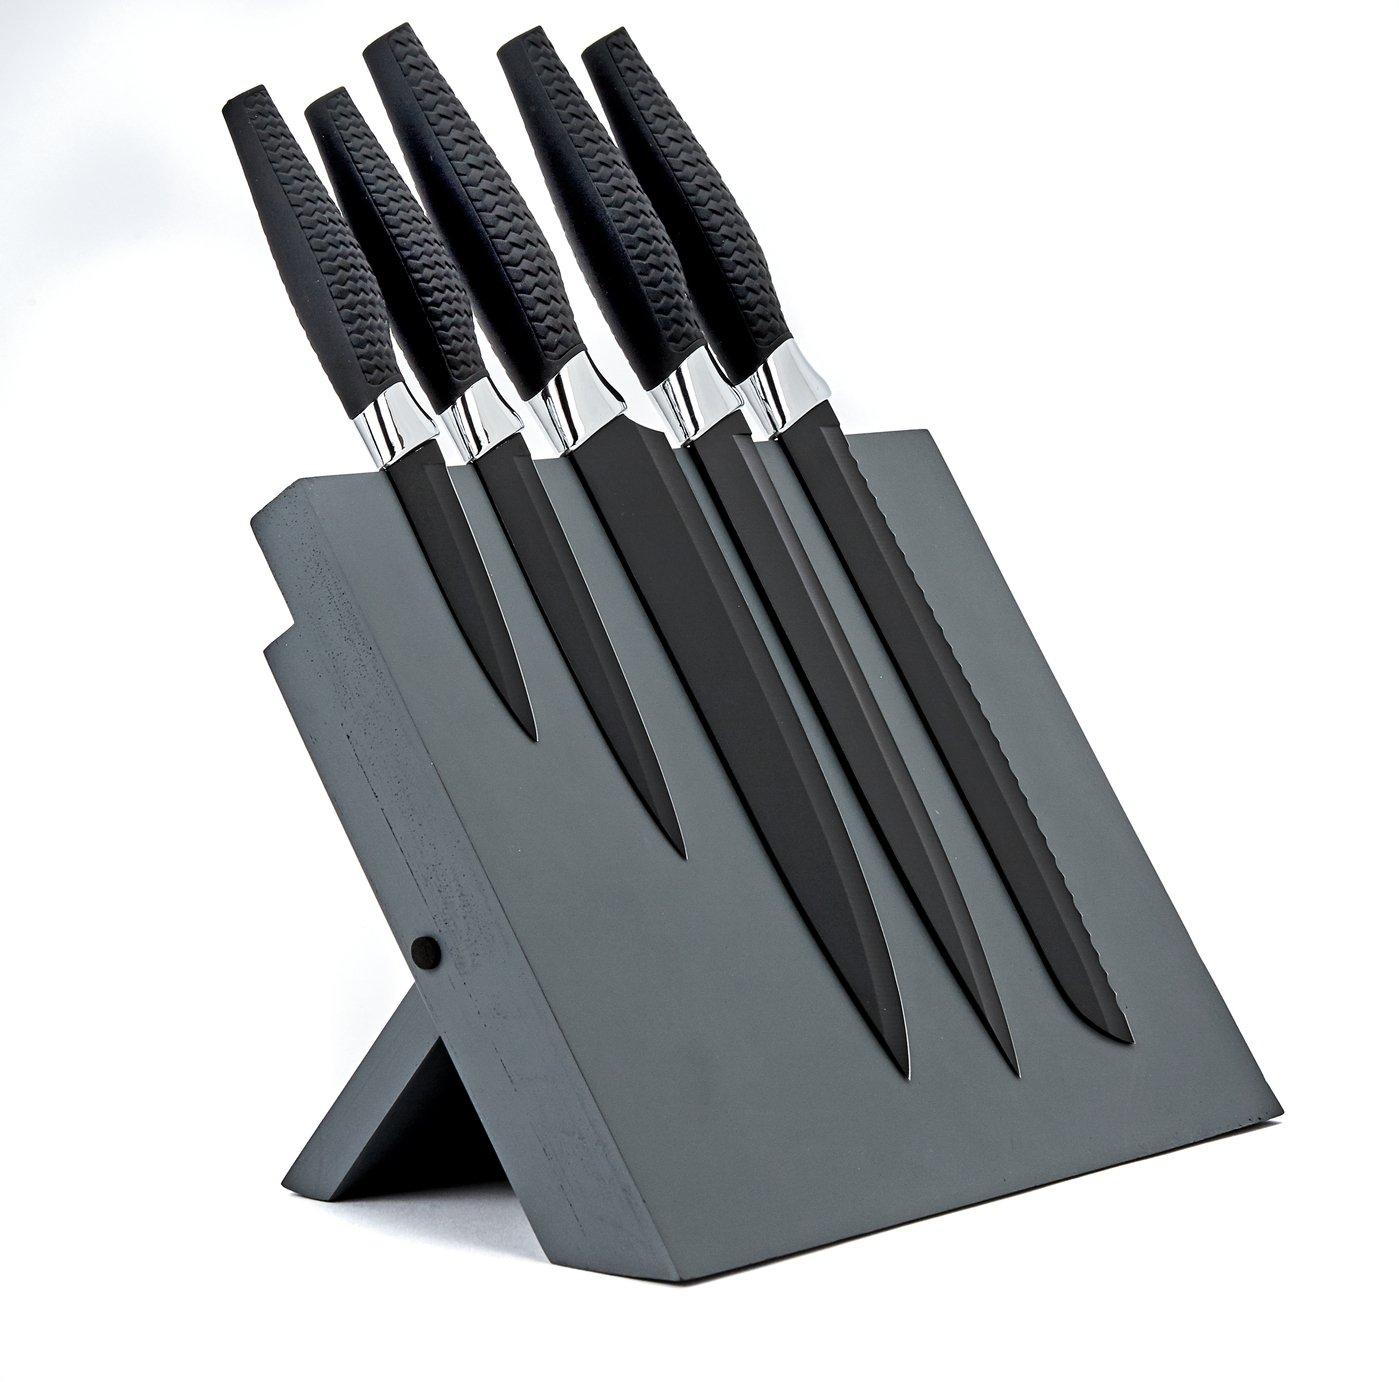 Argos Home 5 Piece Magnetic Knife Block Set - Chrome £17.50 at Argos